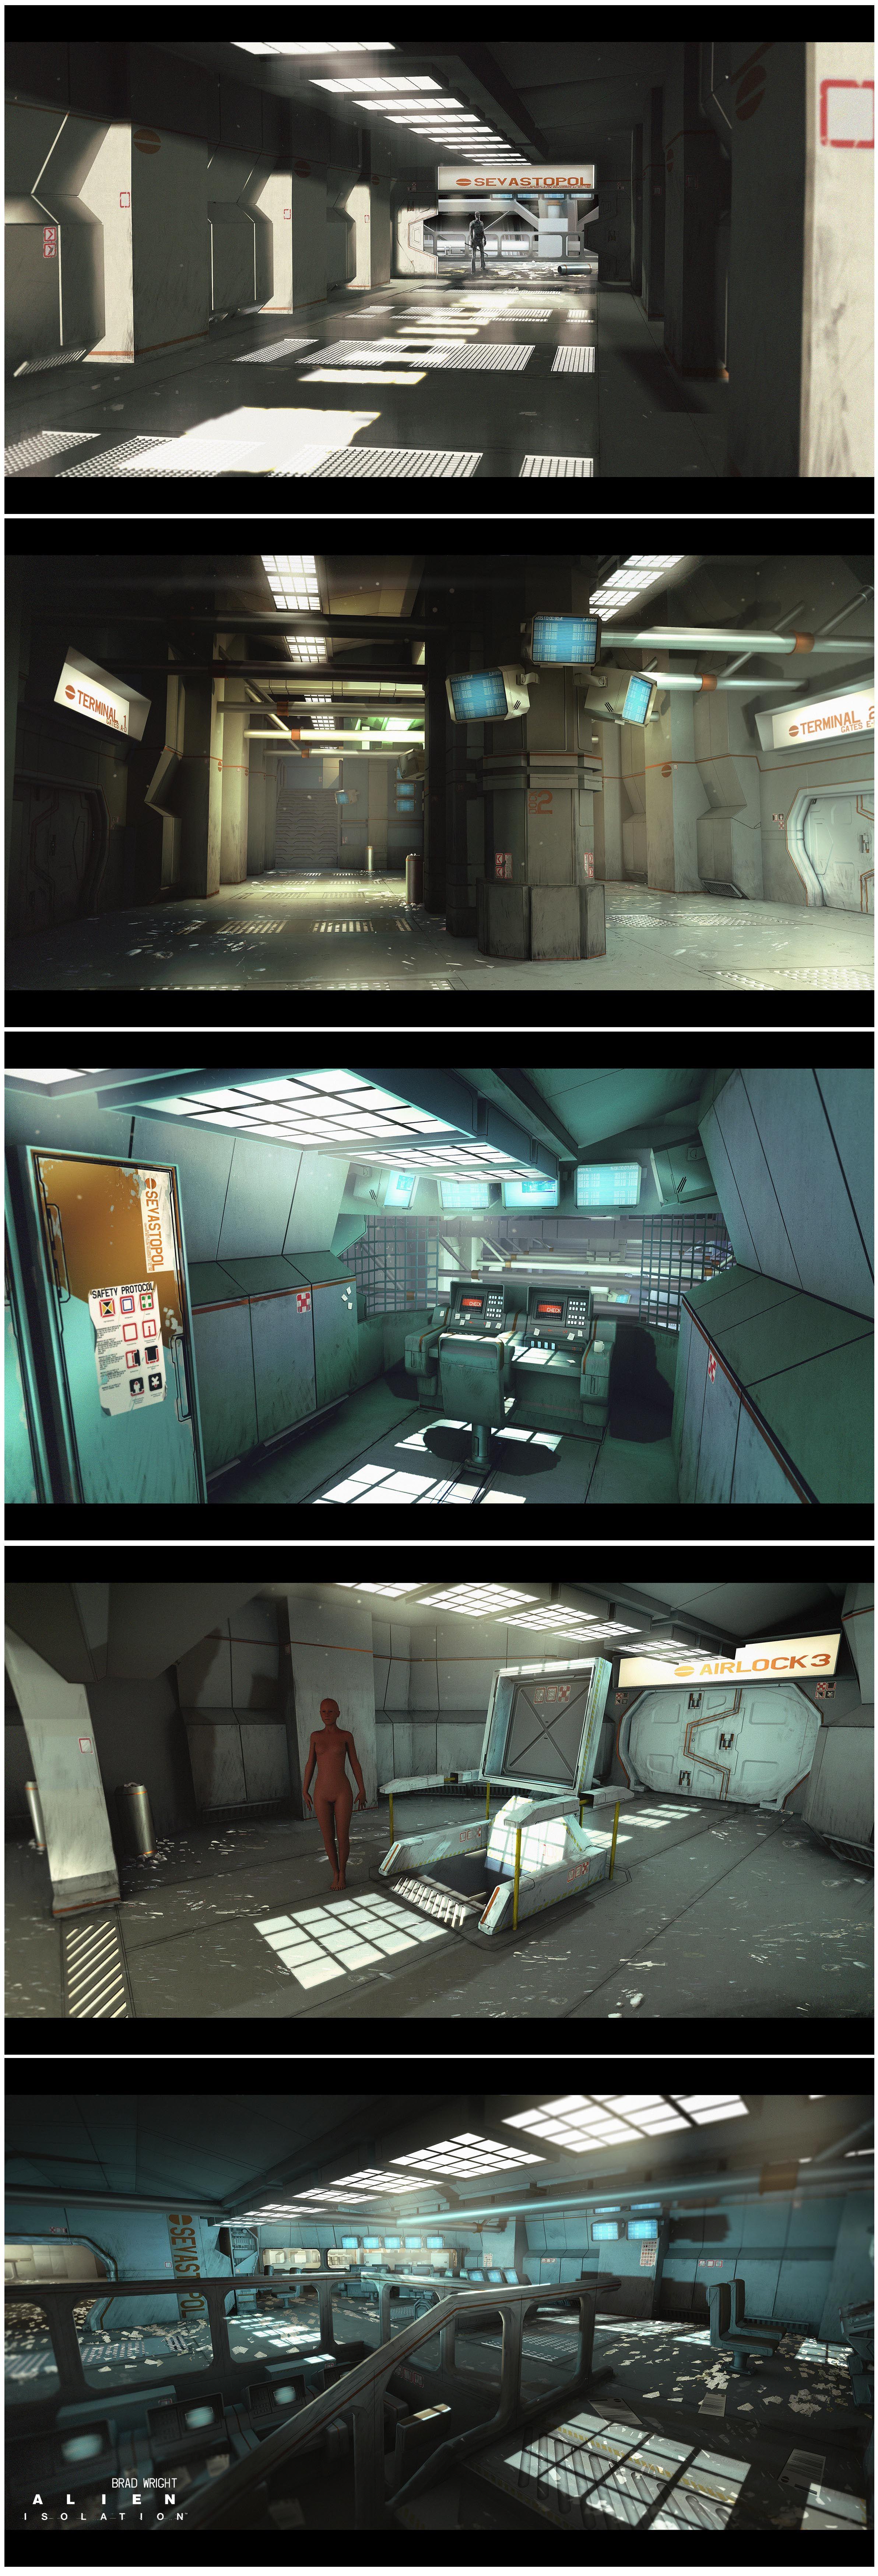 pingl par ulrick wery sur video game alien isolation arte conceptual arte et naves. Black Bedroom Furniture Sets. Home Design Ideas